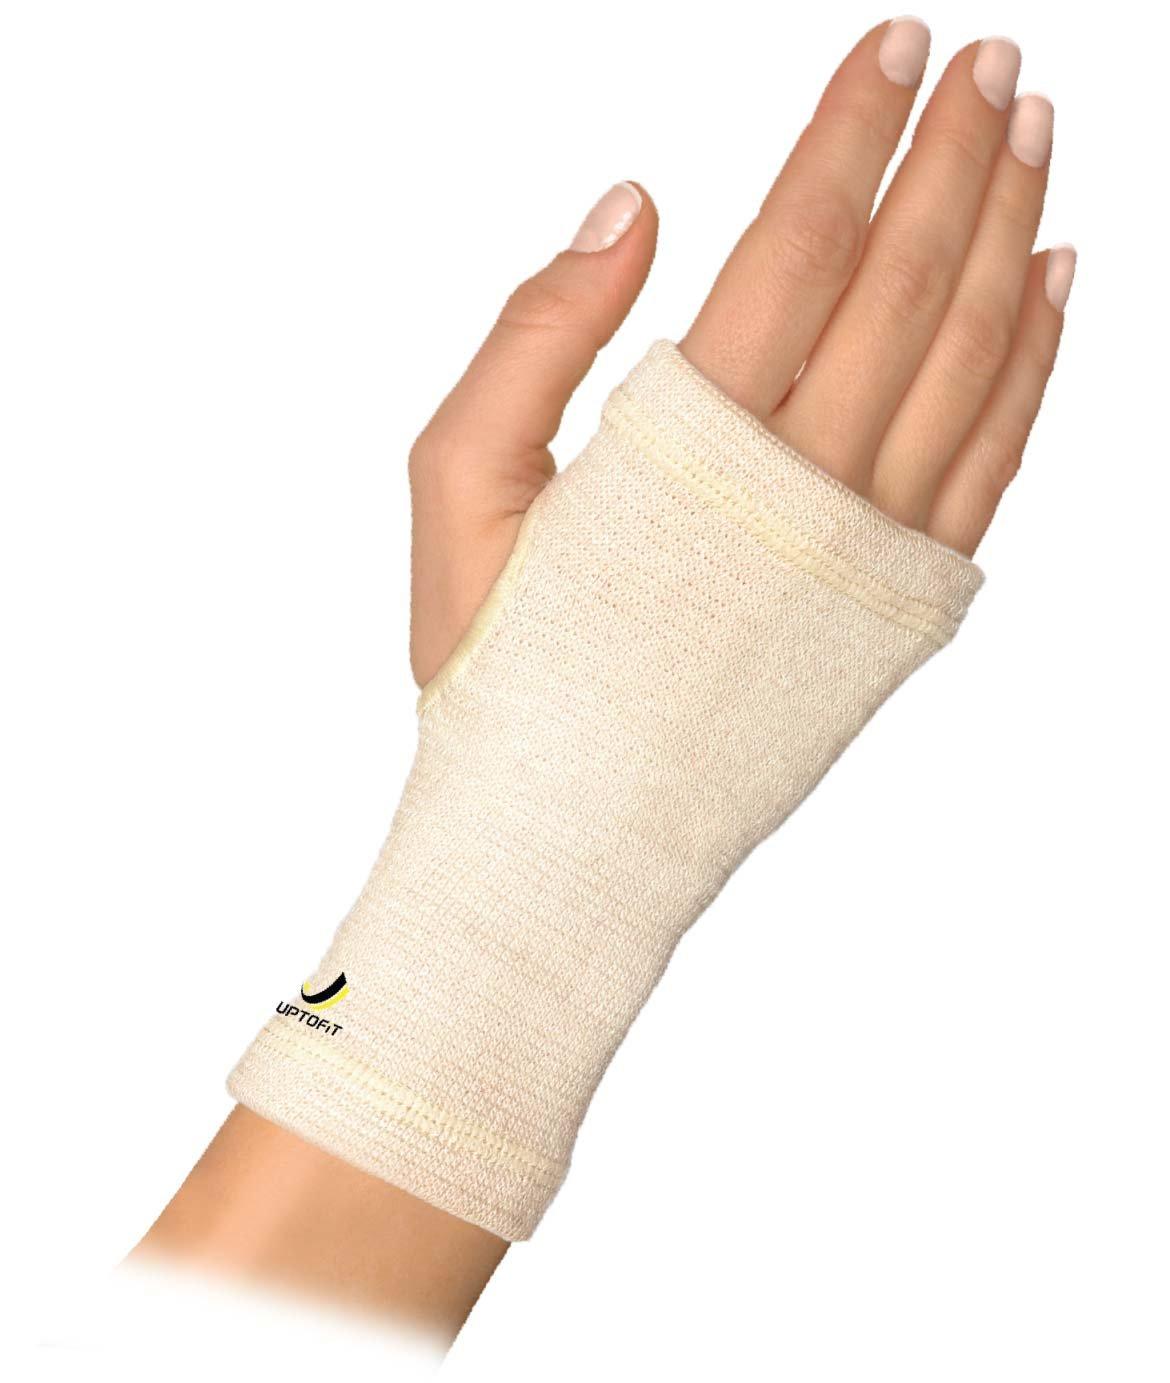 UPTOFIT Copper Wrist Compression Sleeve Carpal Tunnel Compression Hand Brace Lightweight Every Day and Night Support for Arthritis,Tendonitis,Bursitis,Wrist Sprain (M)